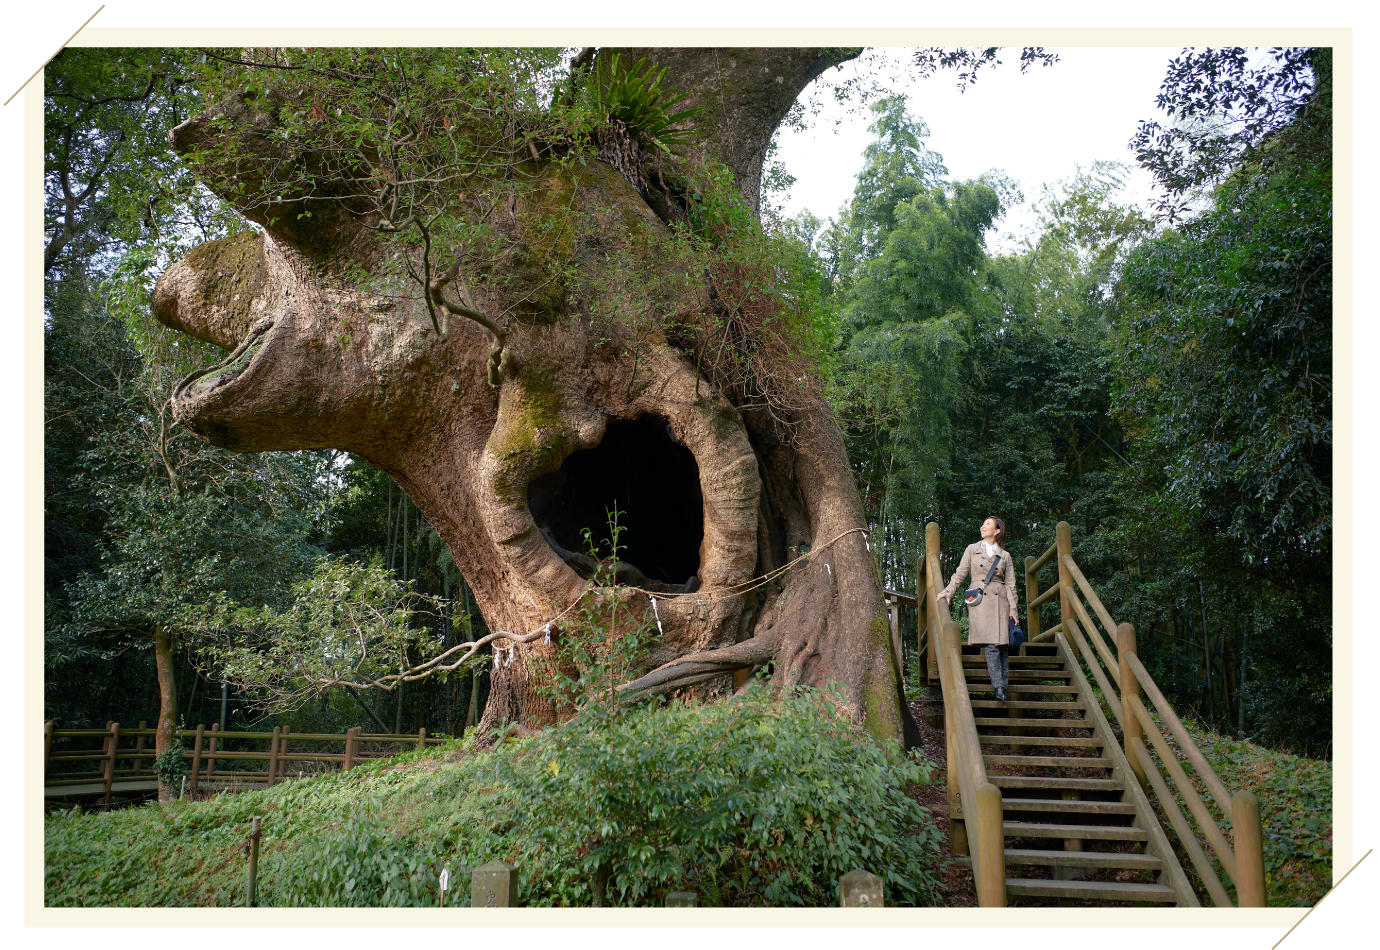 Miki Maya at Tsukazaki Kofun Cluster & Giant Camphor Tree in Tsukazaki